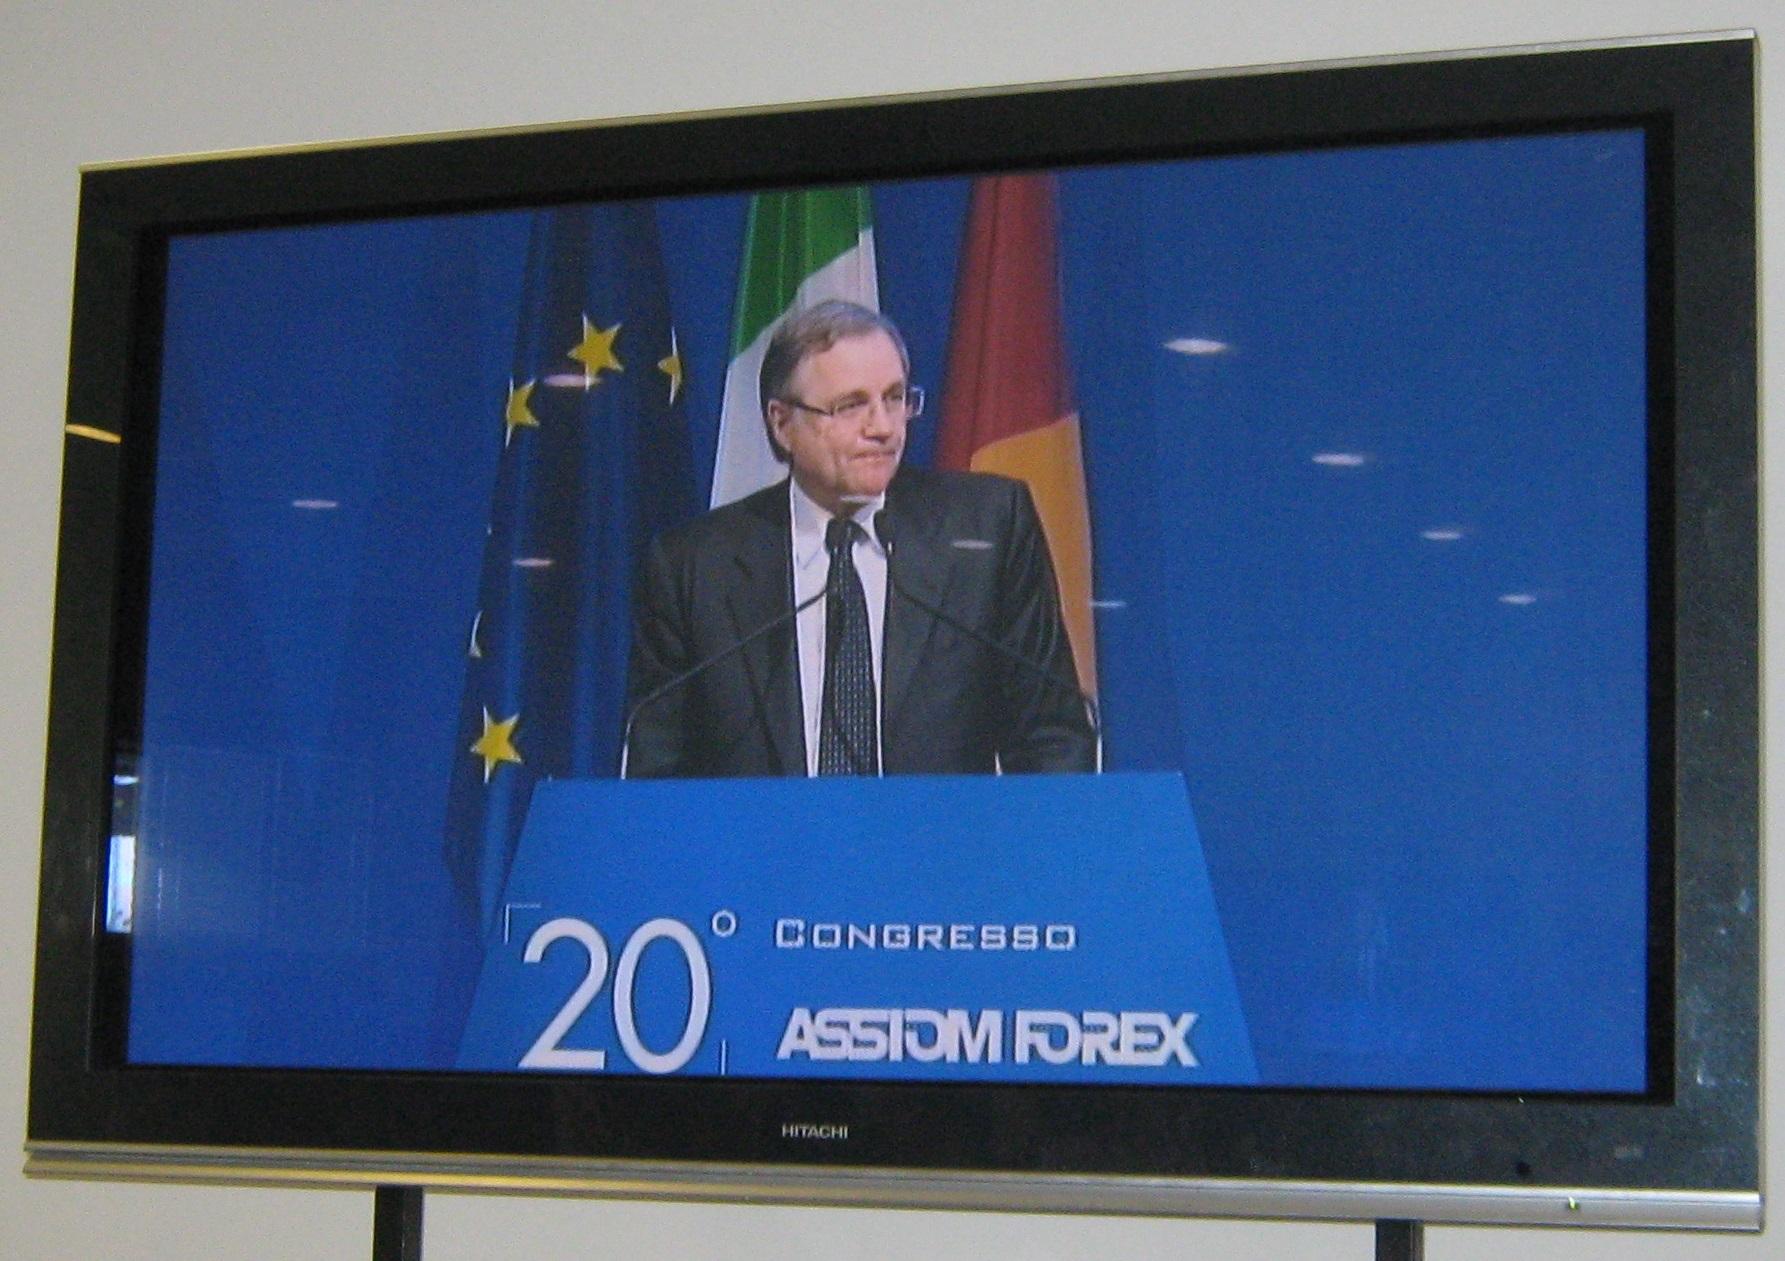 Assiom forex roma 2017